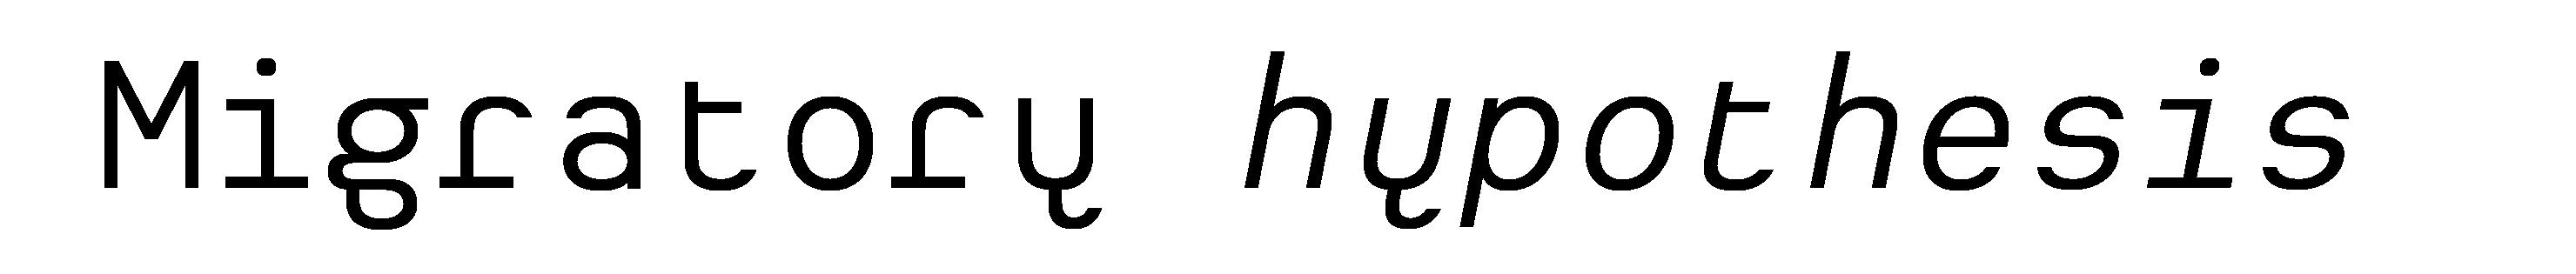 Typeface Heimat Mono D03 Atlas Font Foundry